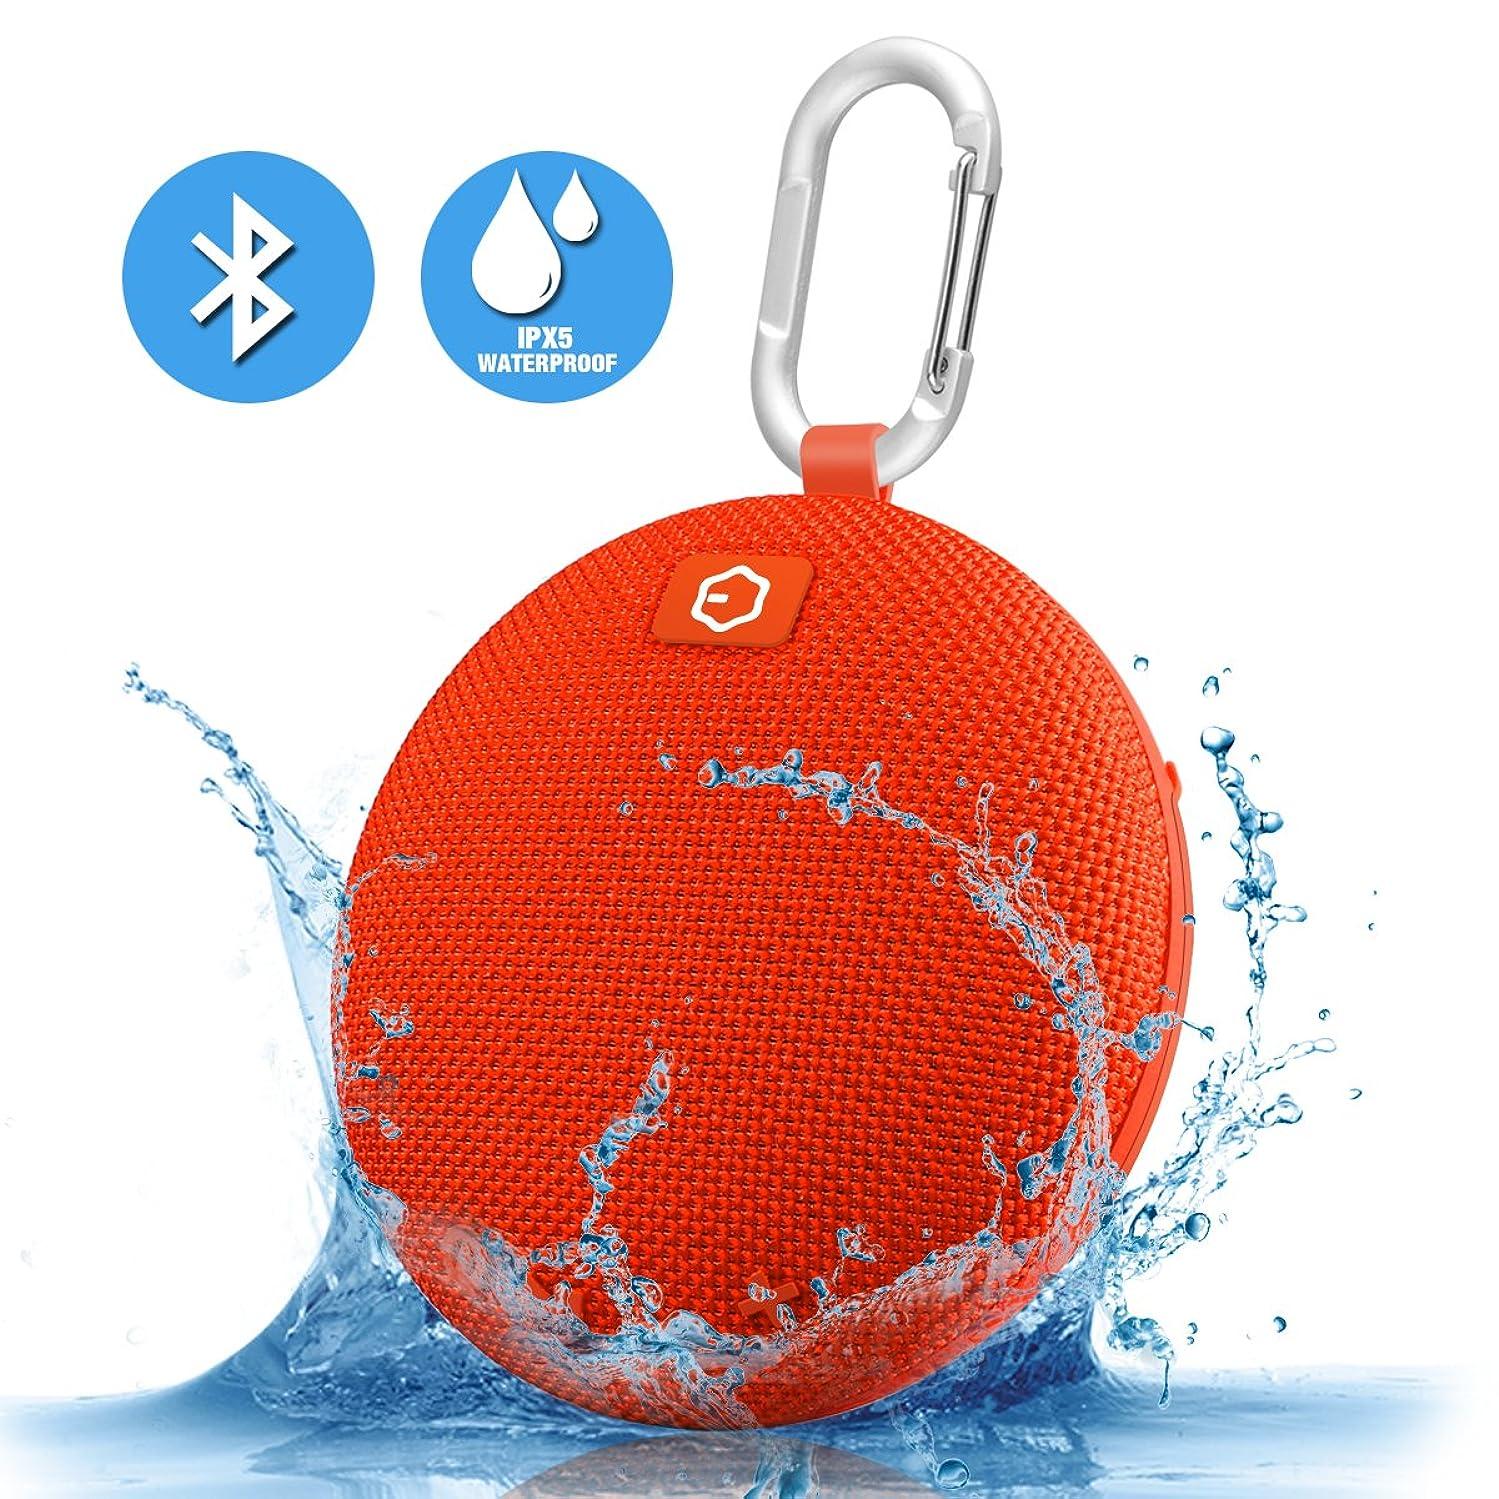 Portable Speaker,Ozzie Bass Stereo Bluetooth 4.0 Travel Outdoor Sport Speaker Waterproof Wireless Mini Bluetooth Speaker Indoor Shower Speaker for iPhone,Android (Orange)